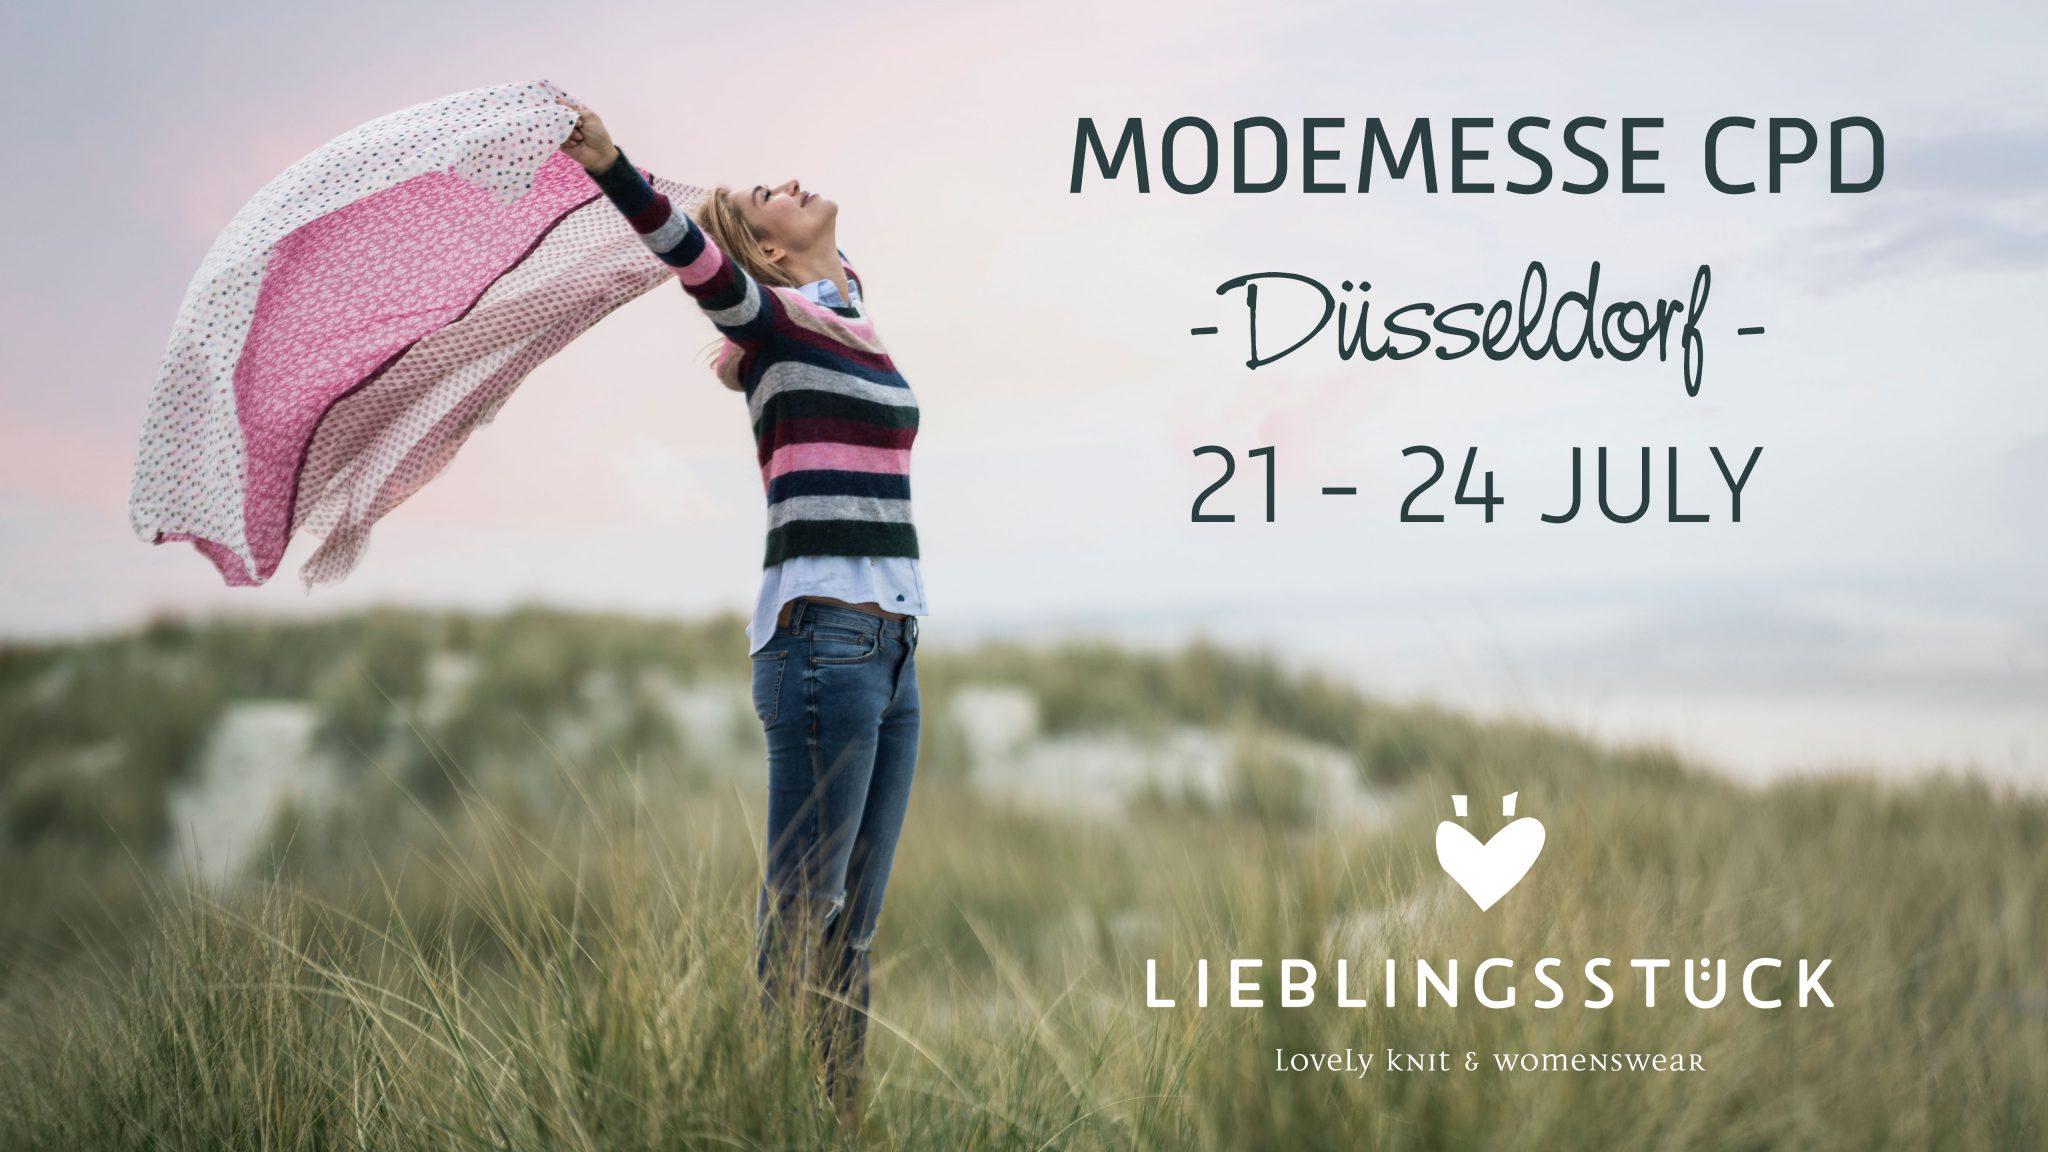 Lieblingsstueck Modemesse Messe CPD Düsseldorf